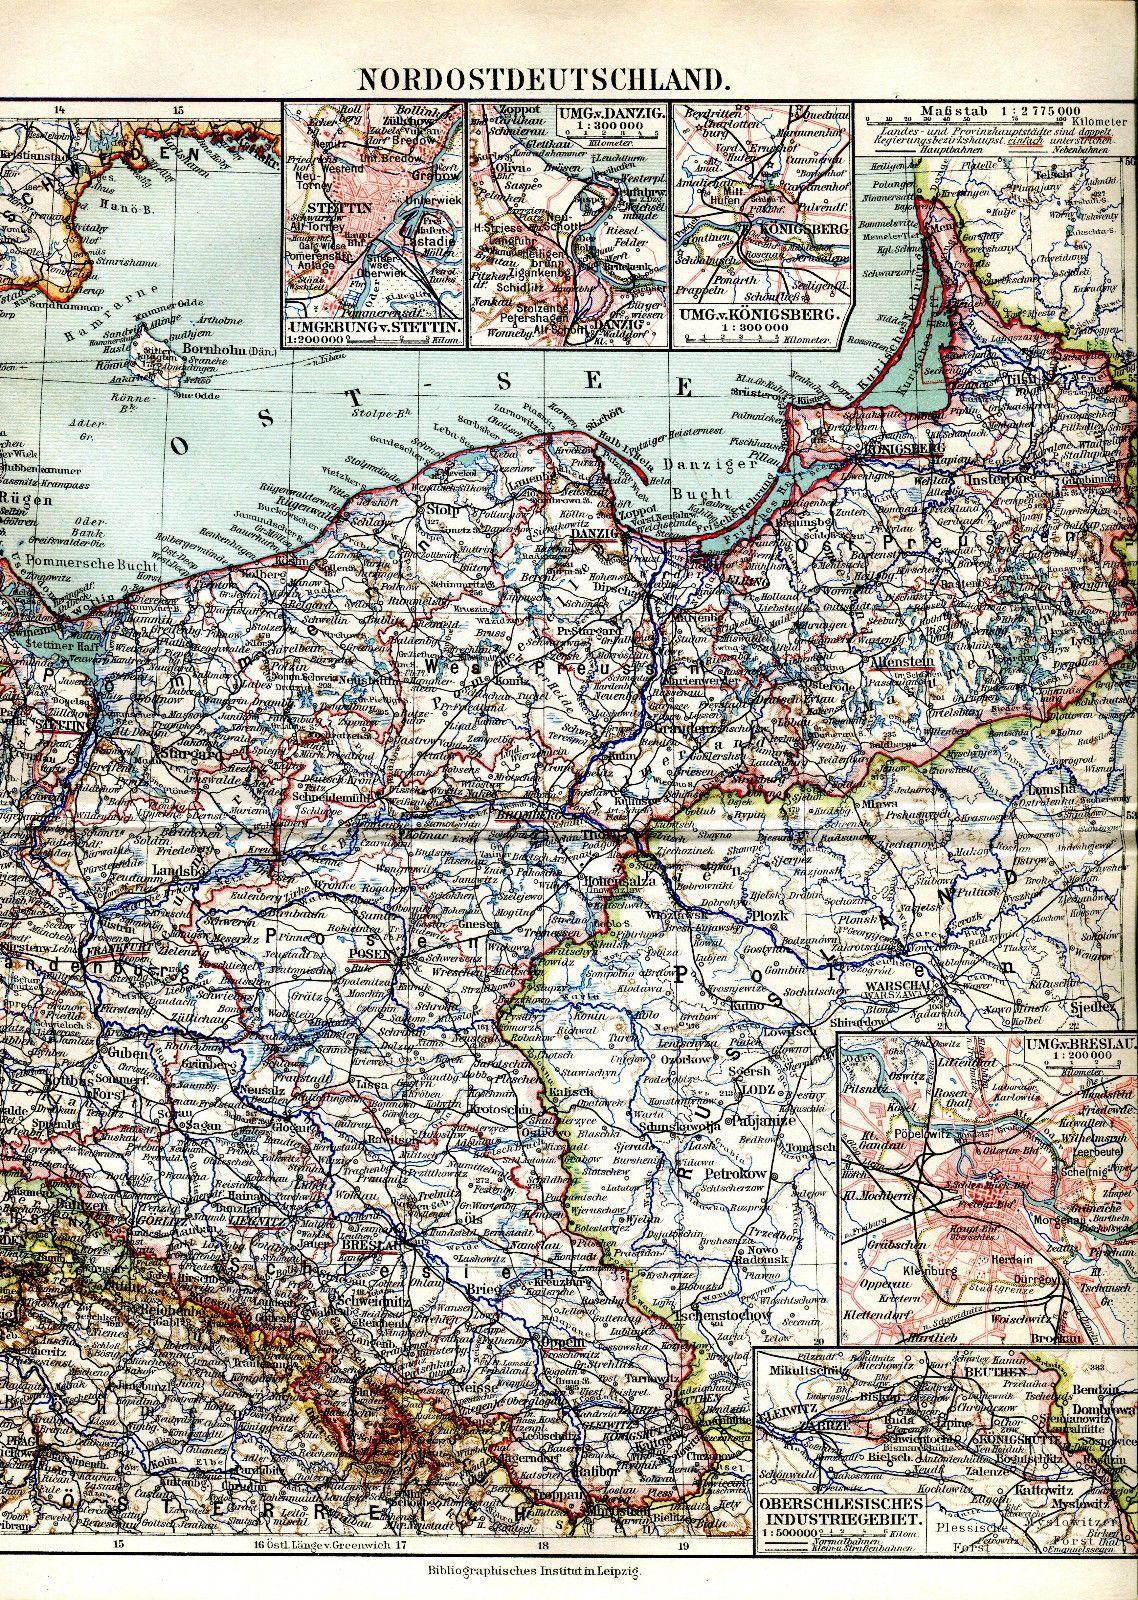 Ca 1890 Northern Germany Prussia Poland Stettin Danzig Konigsberg